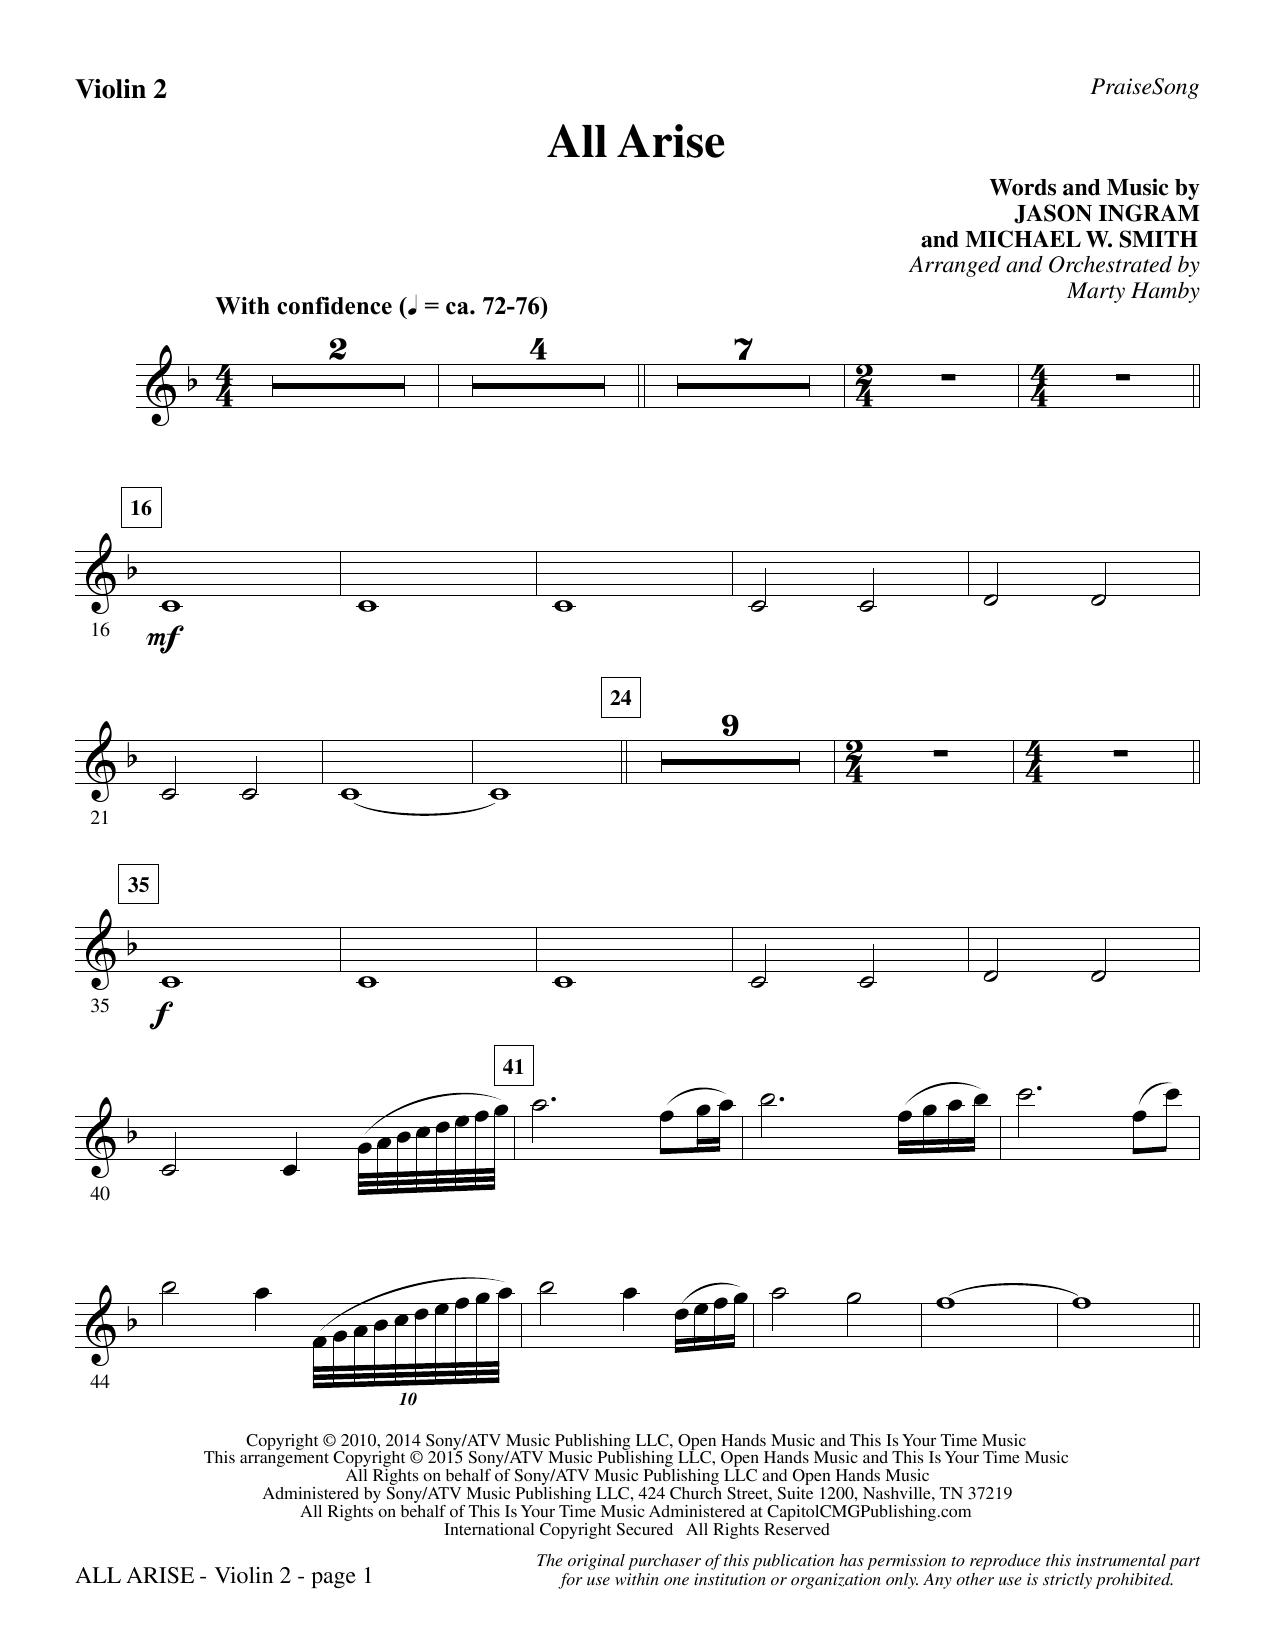 All Arise - Violin 2 sheet music